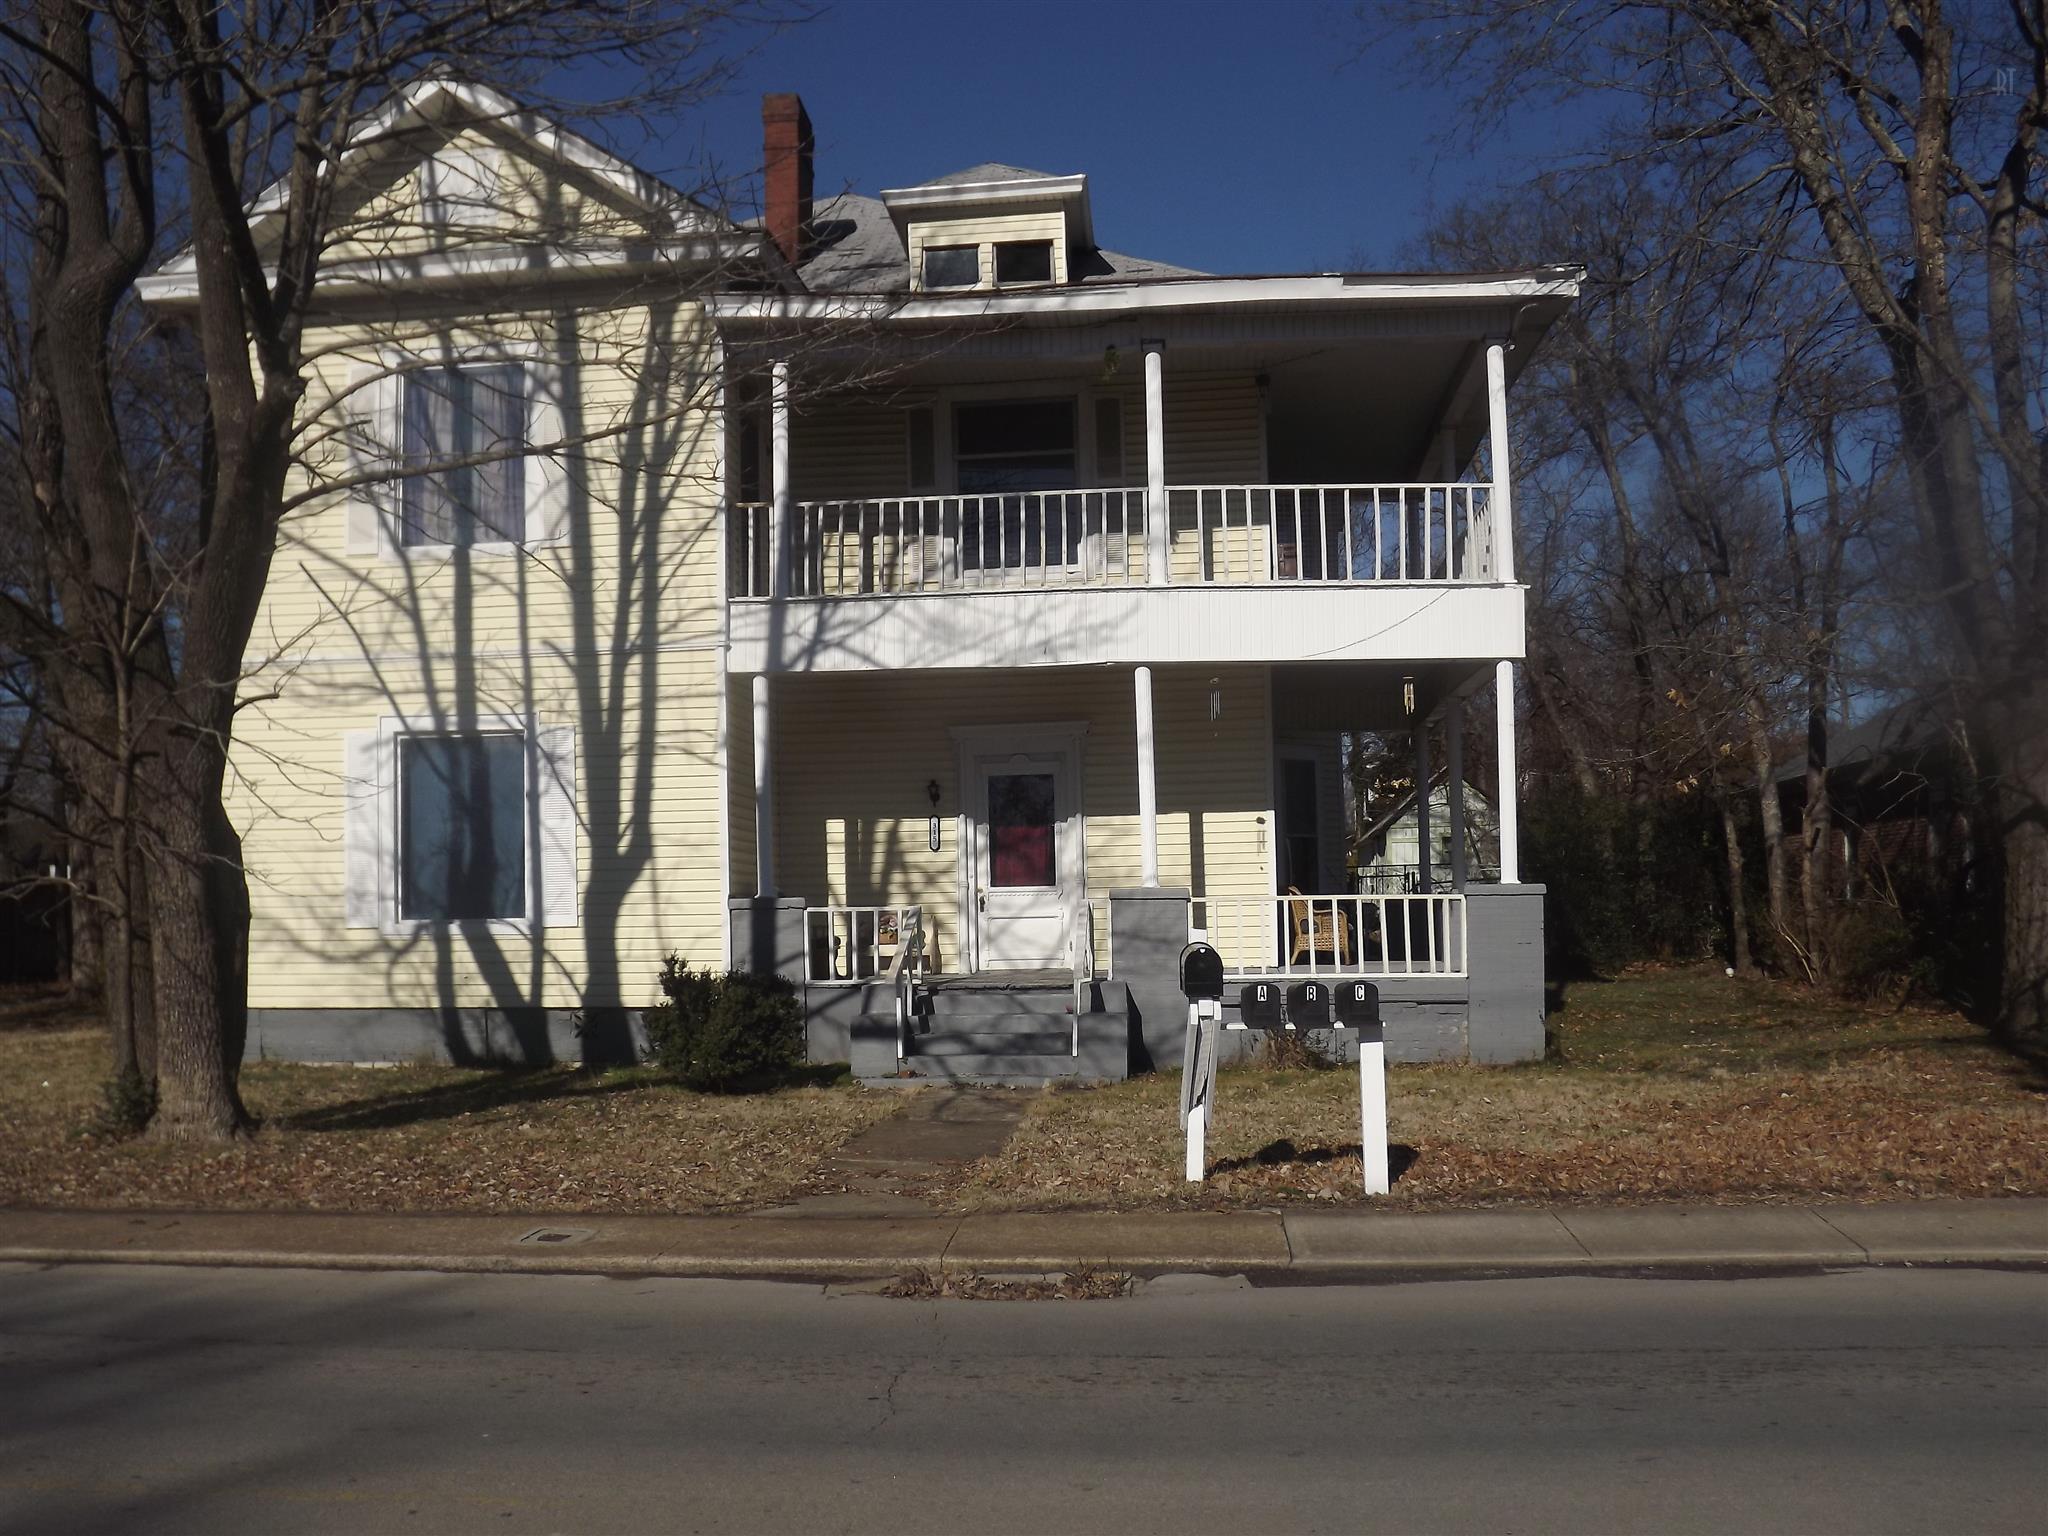 315 E Lane St, Shelbyville, TN 37160